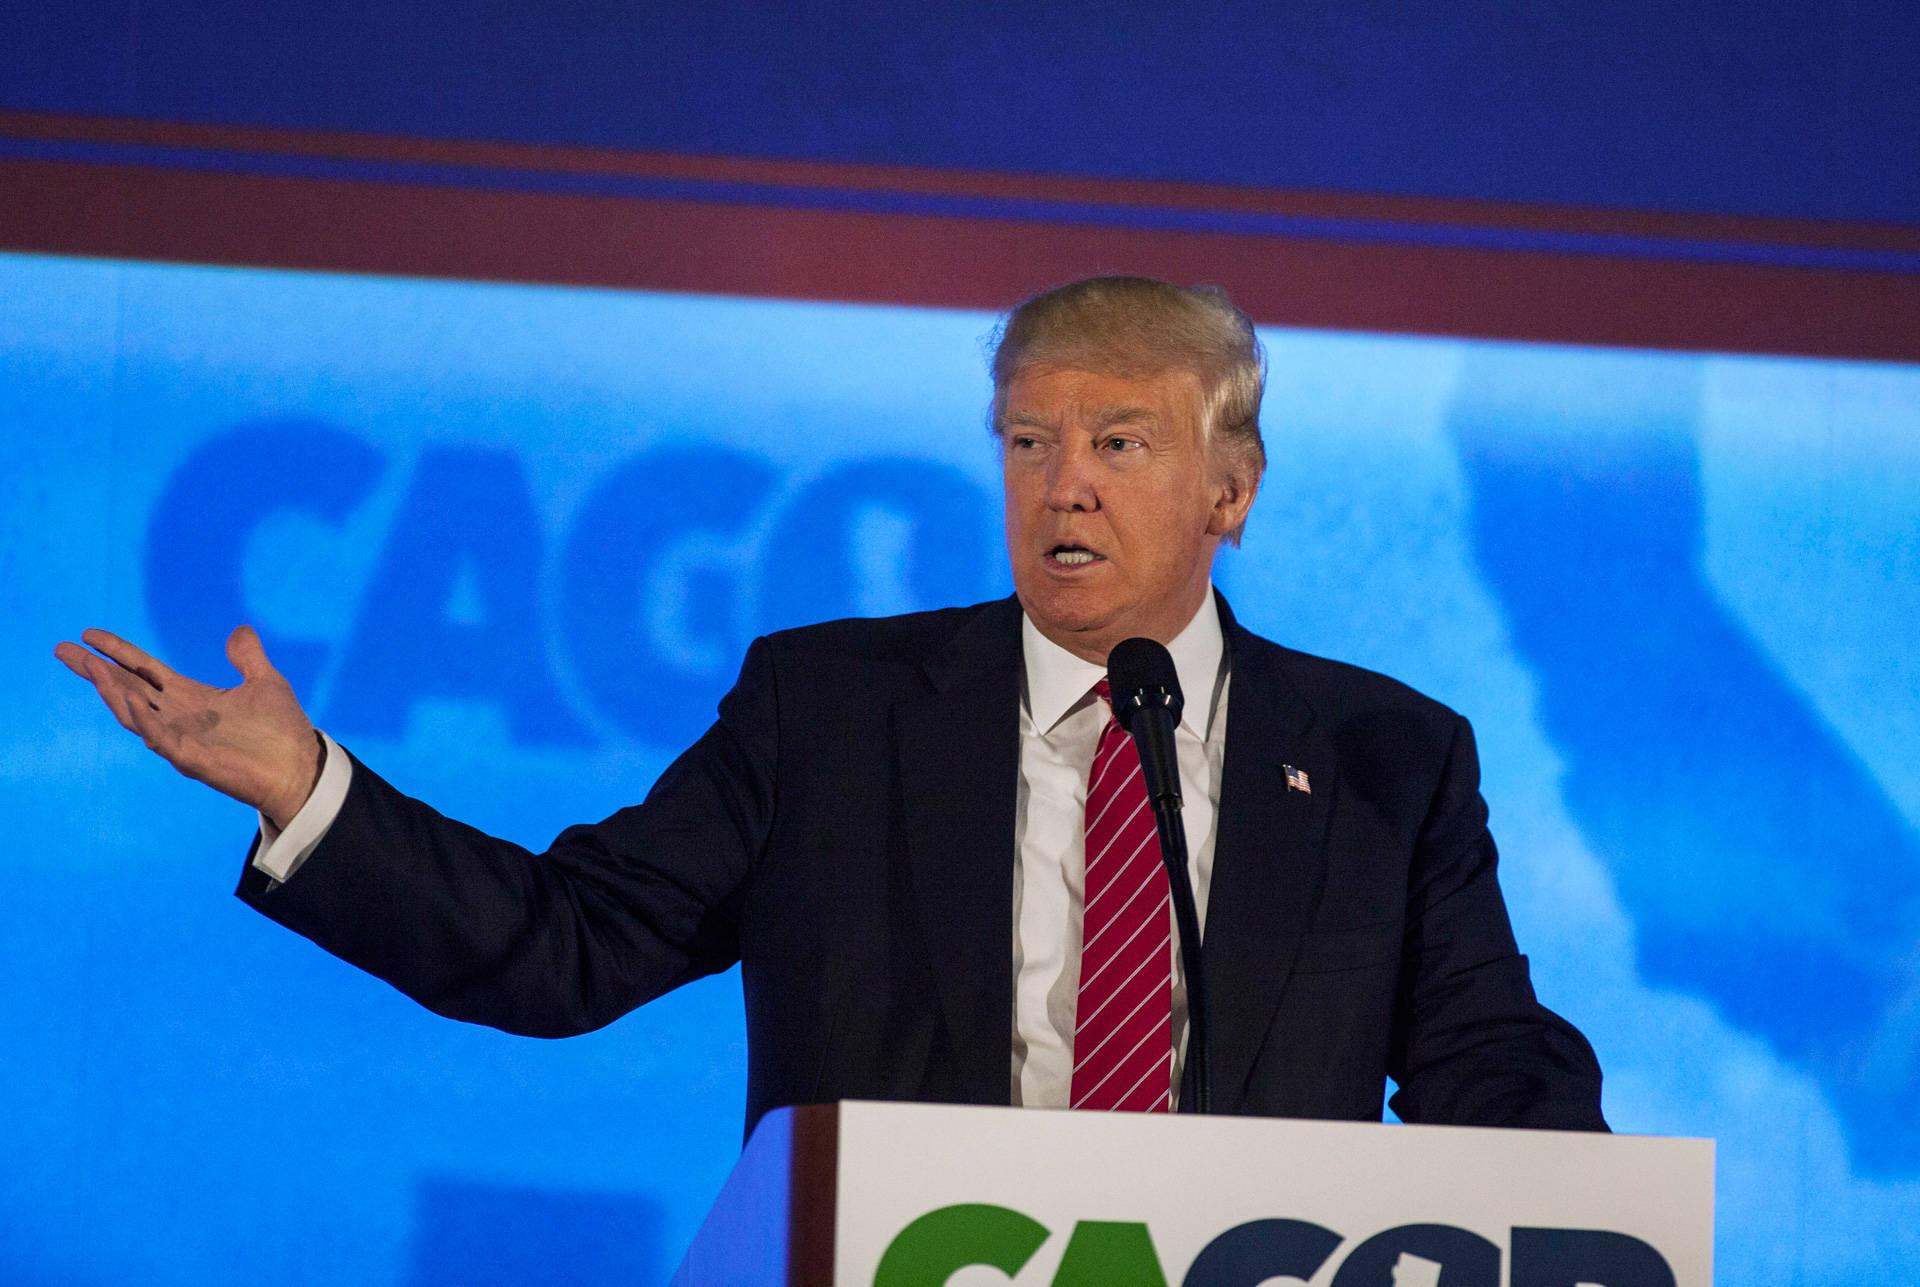 Trump Poses a Love-Hate Quandary for California Republicans